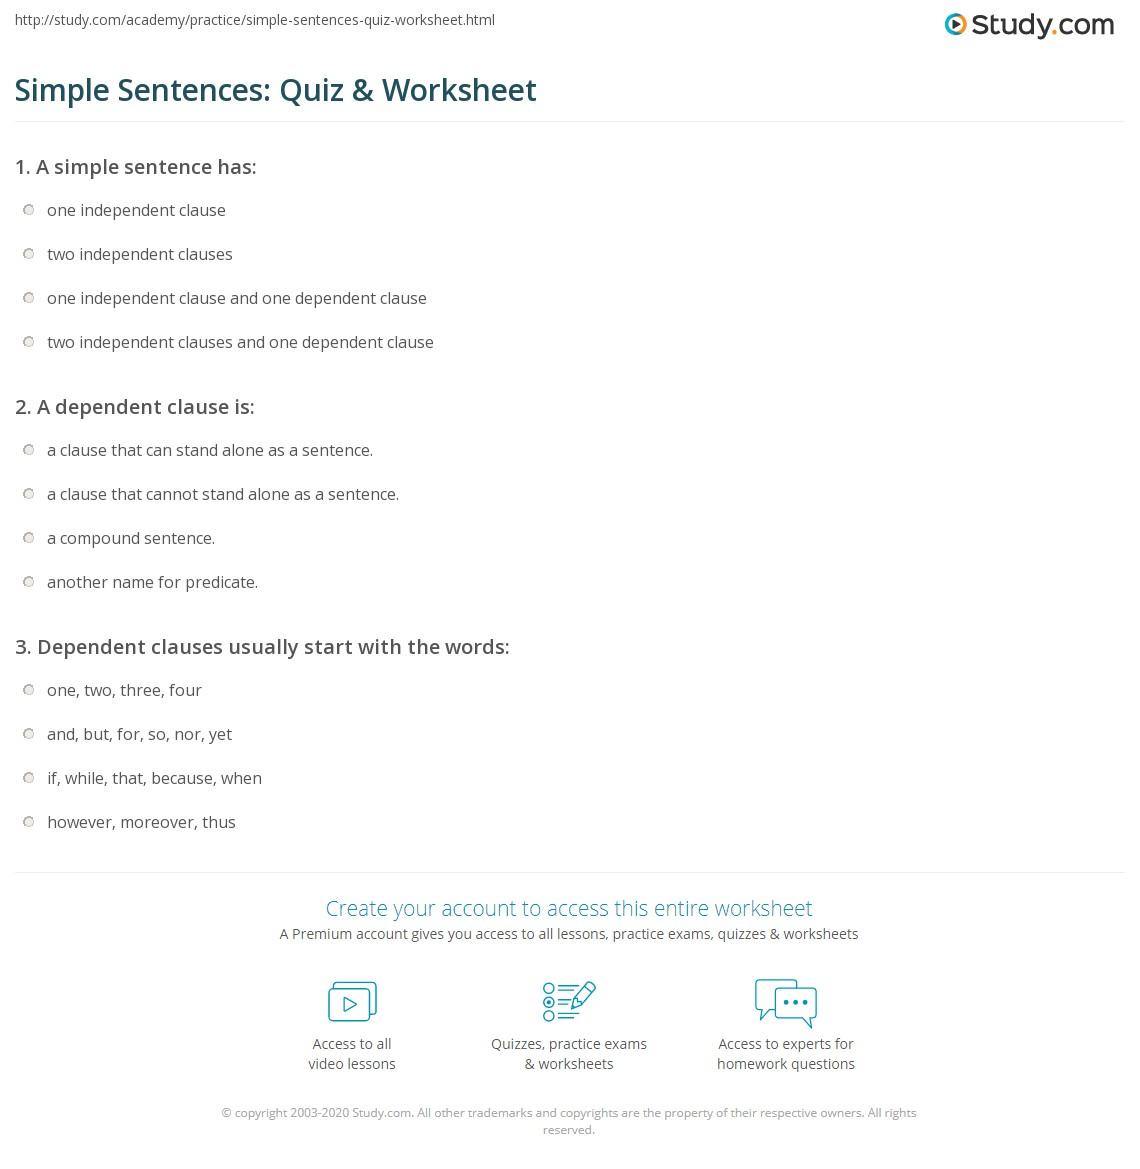 hight resolution of Simple Sentences: Quiz \u0026 Worksheet   Study.com